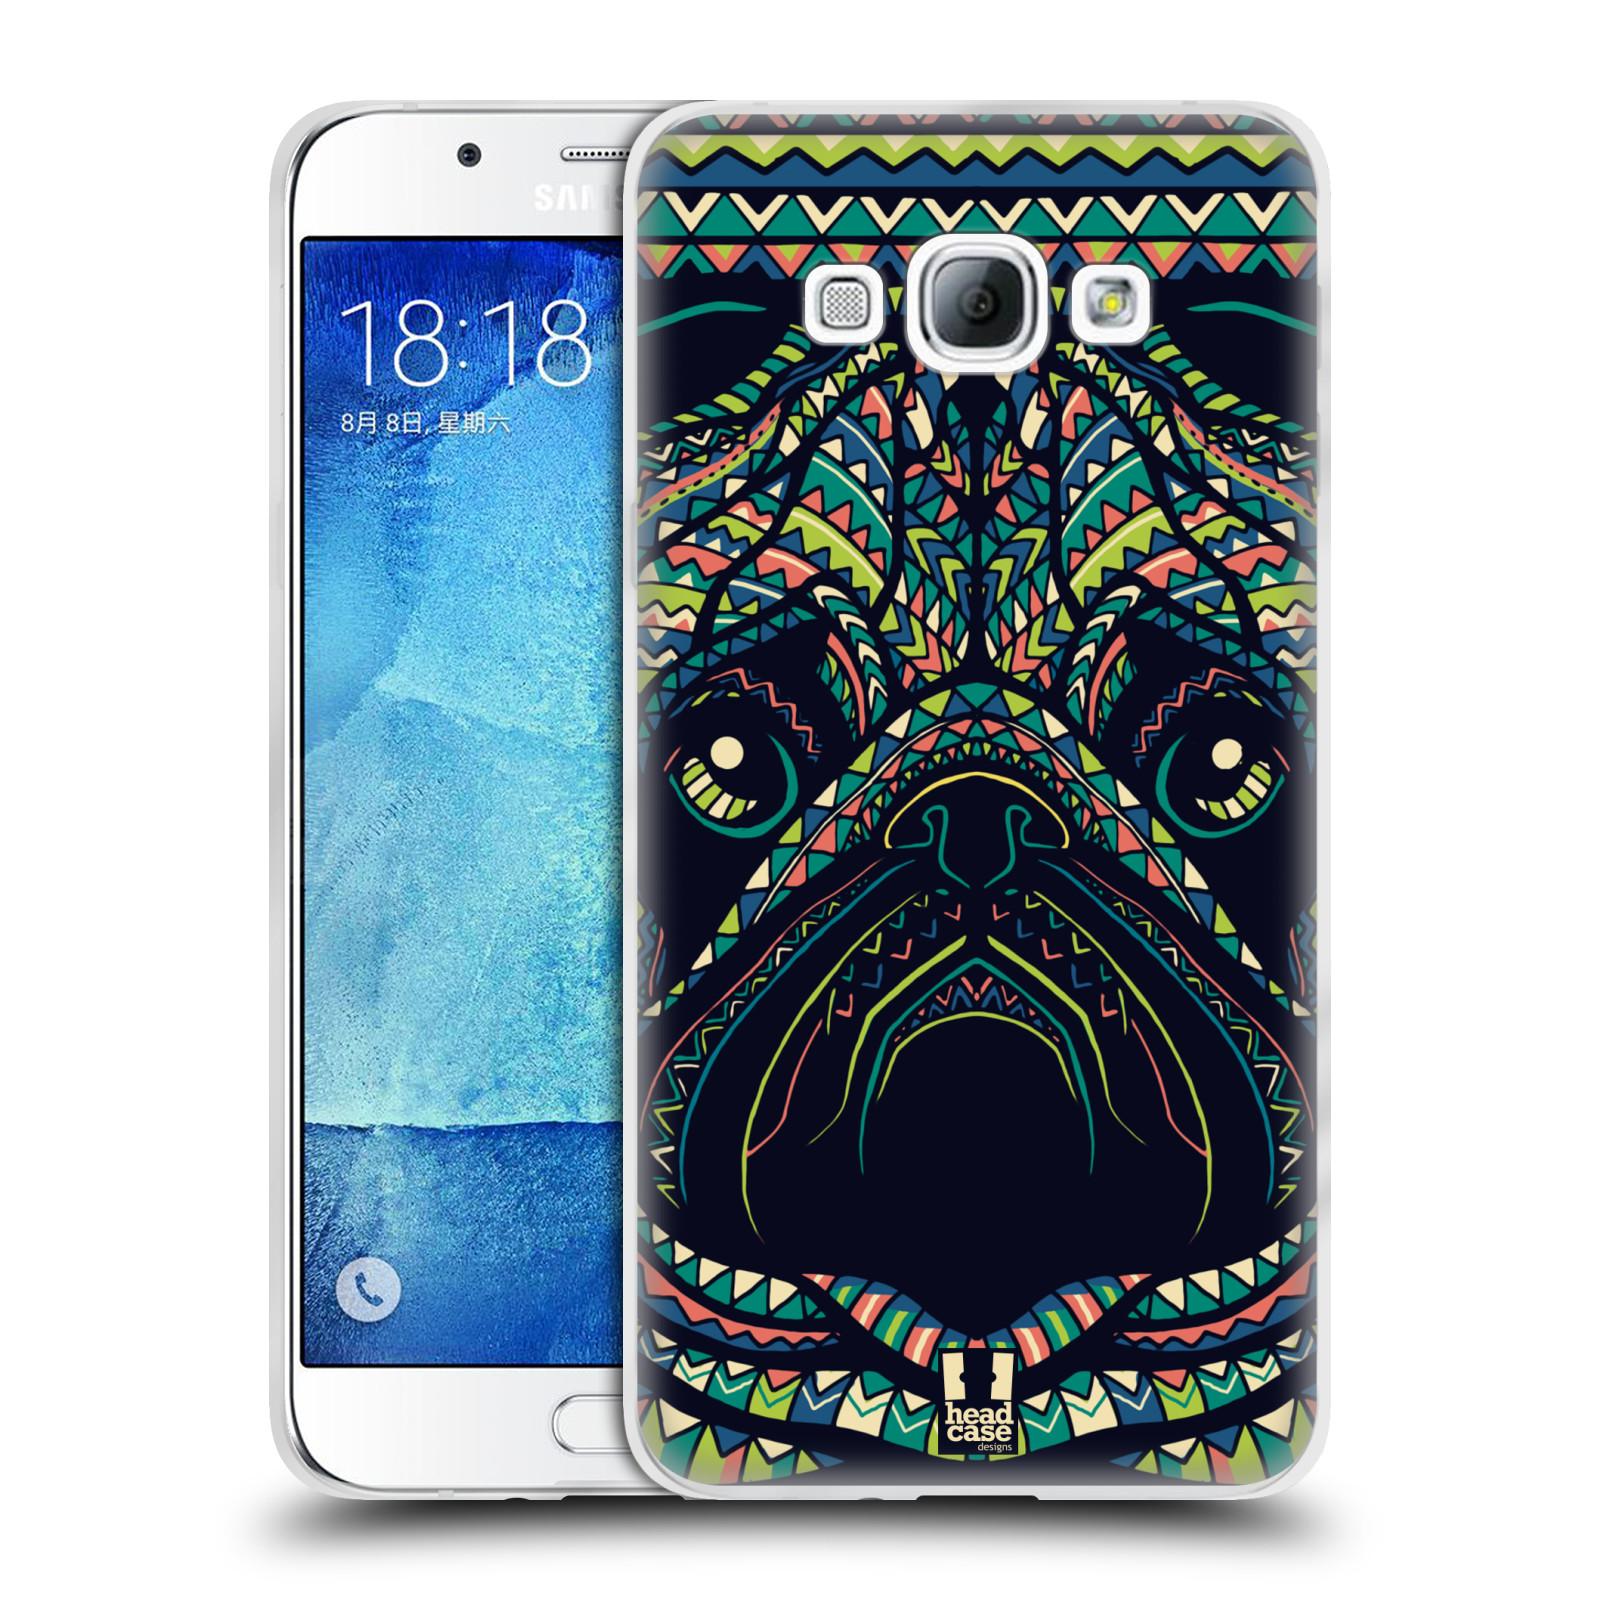 HEAD CASE silikonový obal na mobil Samsung Galaxy A8 vzor Aztécký motiv zvíře 3 mopsík